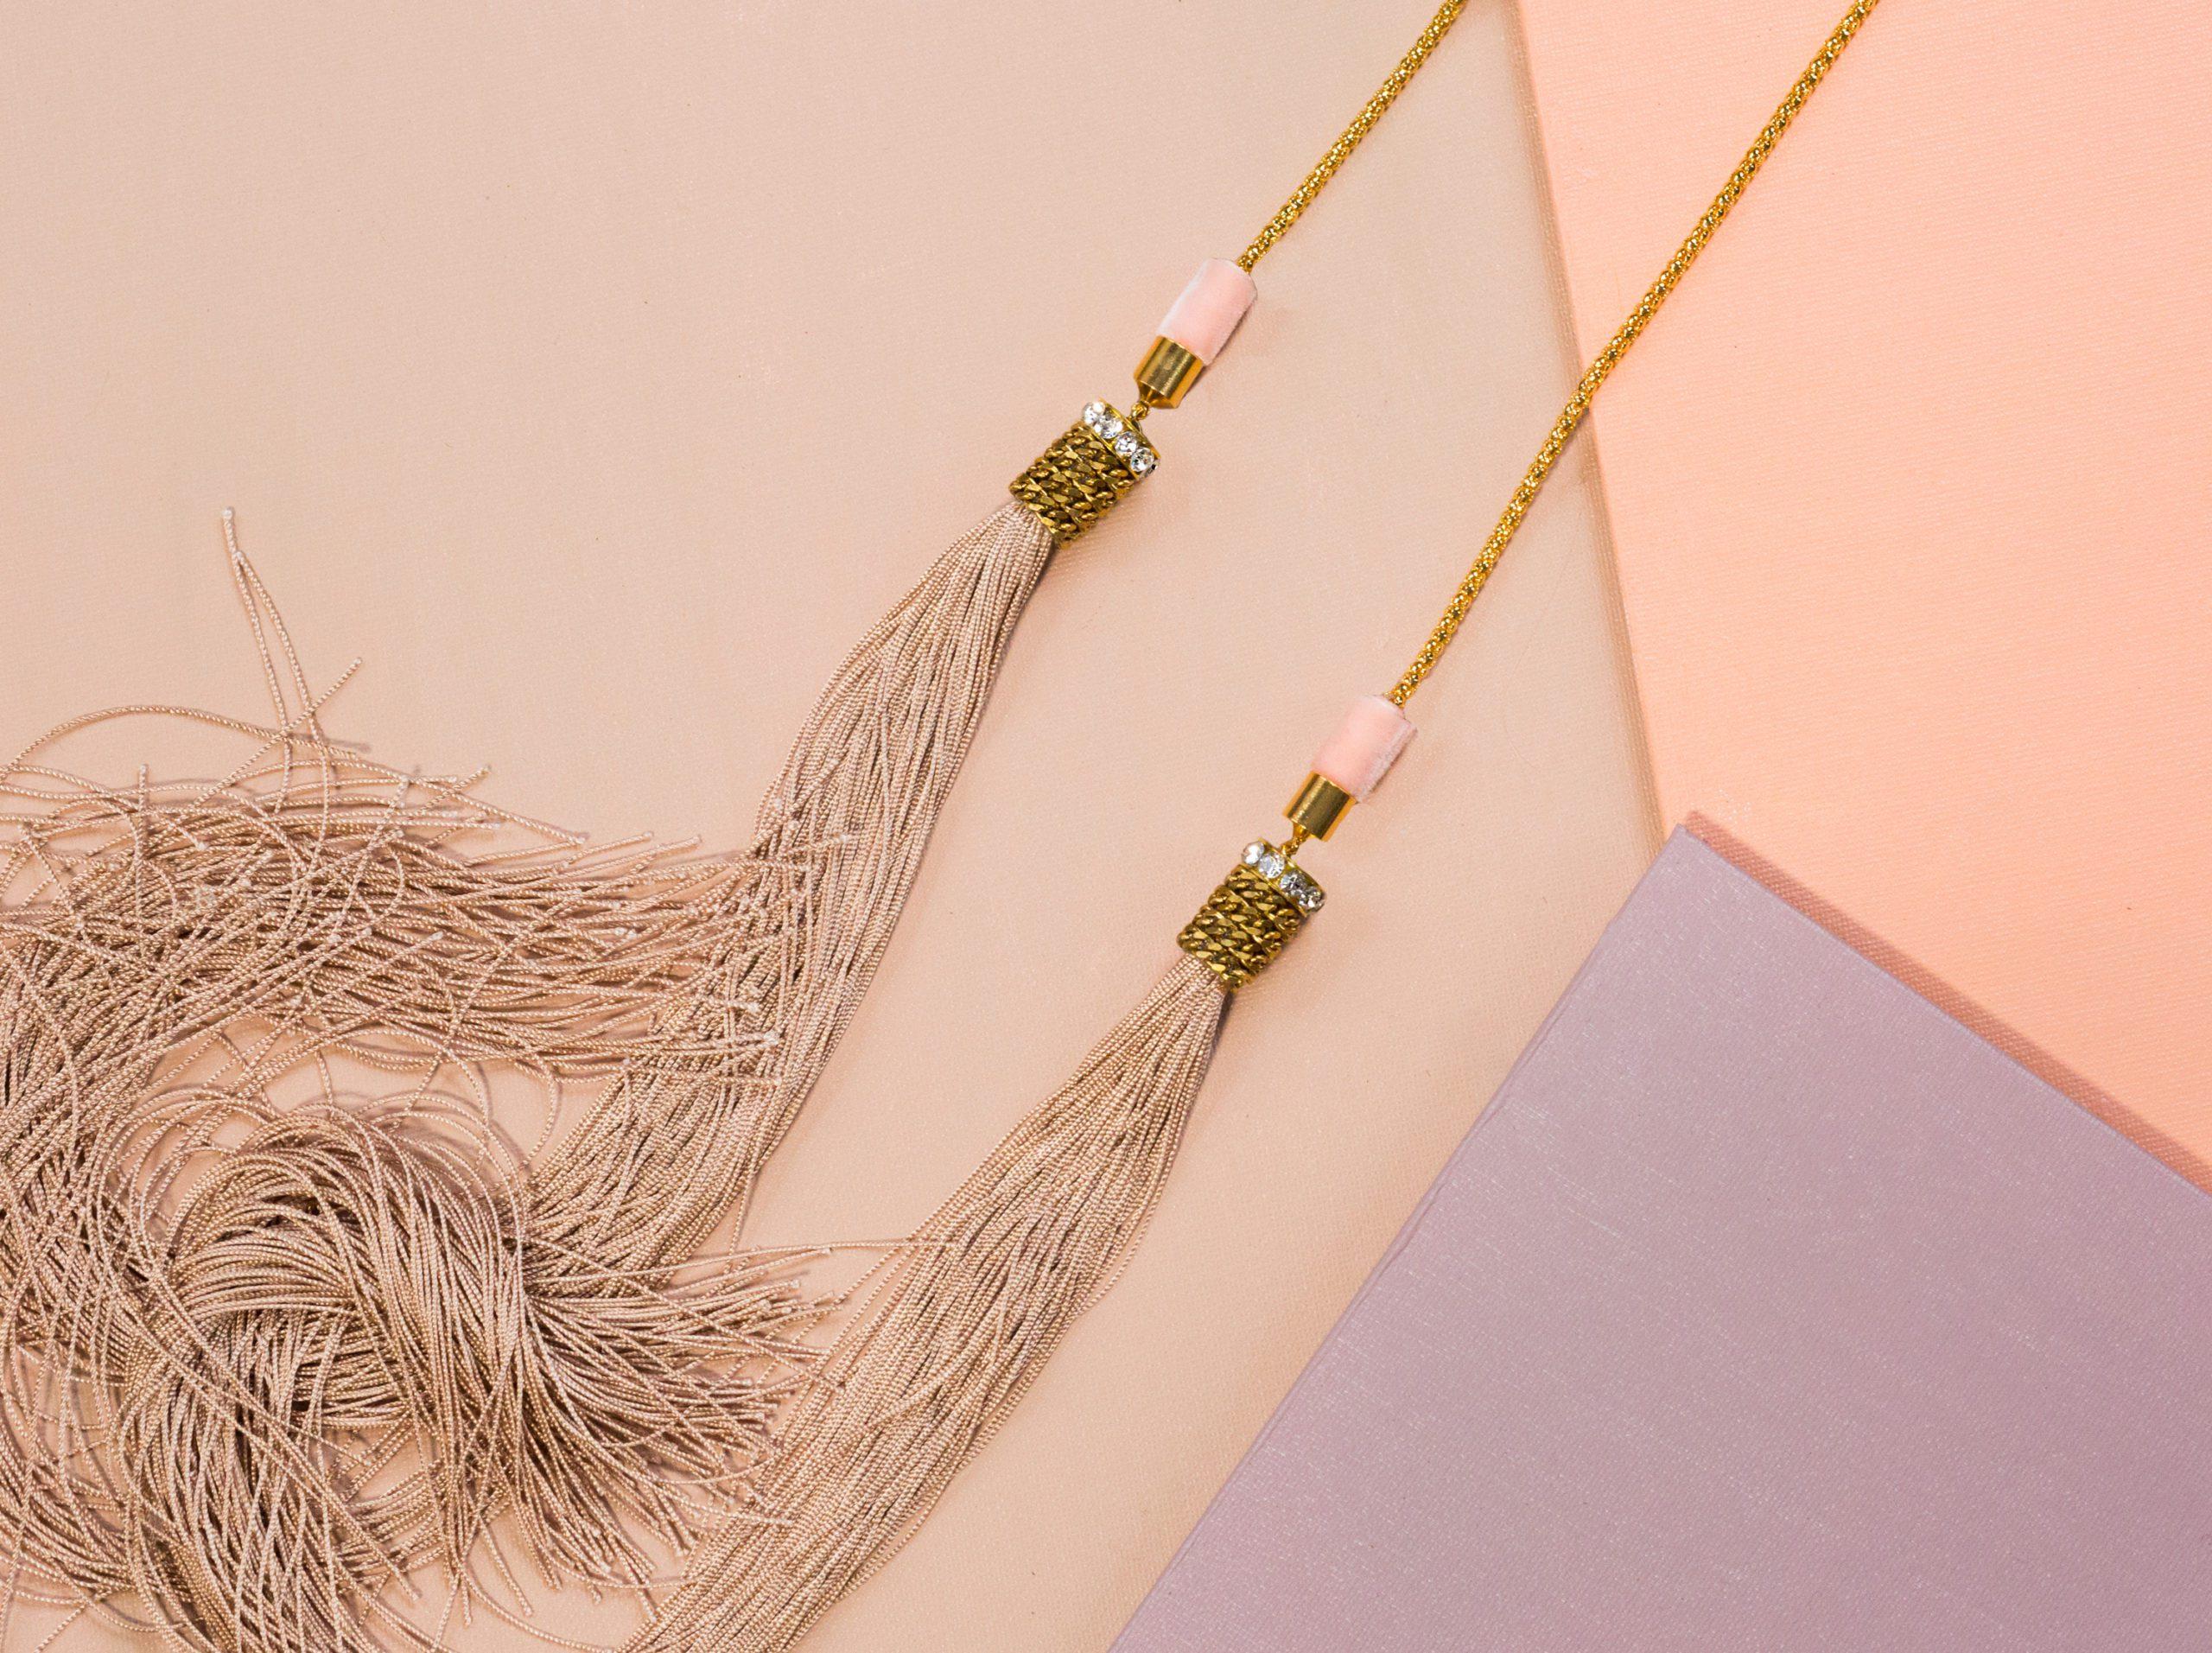 Jardin Blush mimilore travel jewelry wear in the pursuit